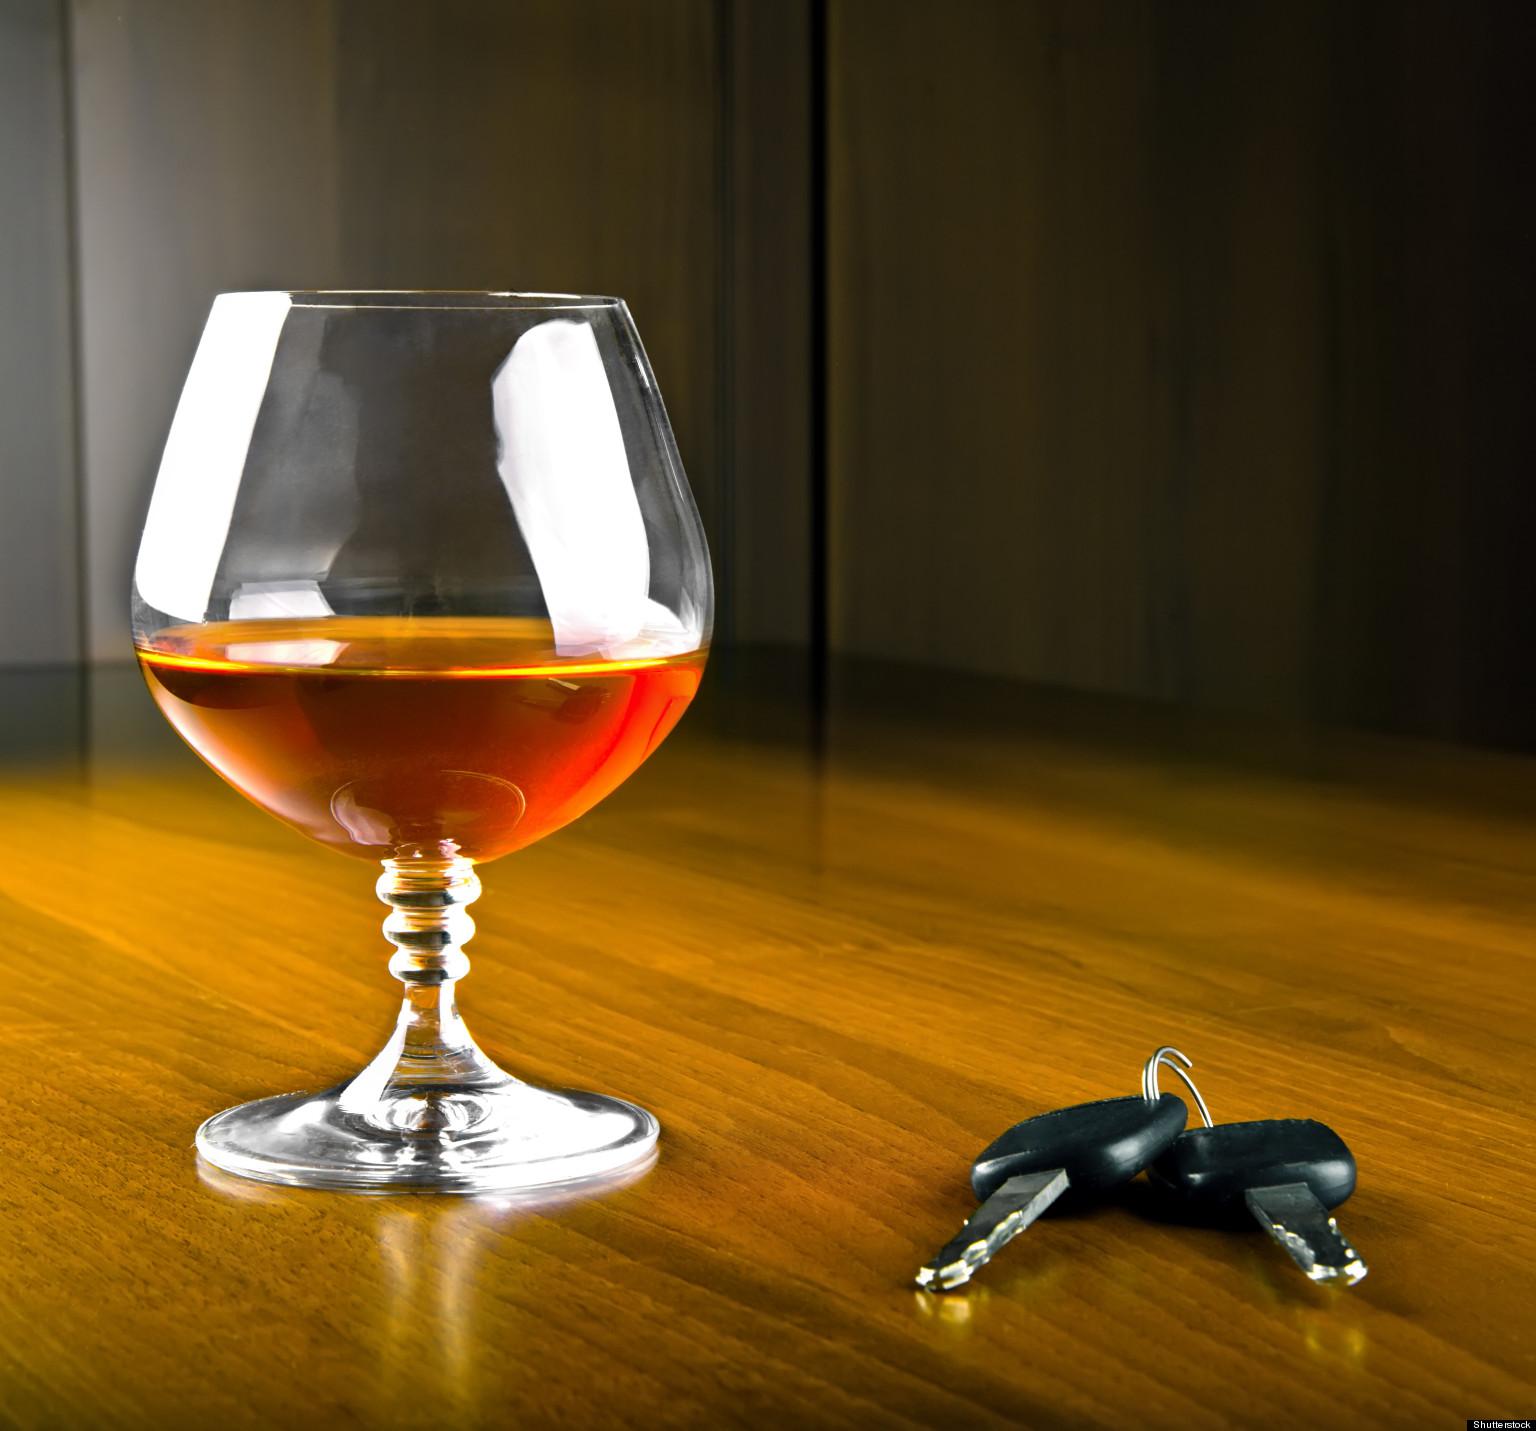 n.h teen drunk driving jpg 422x640